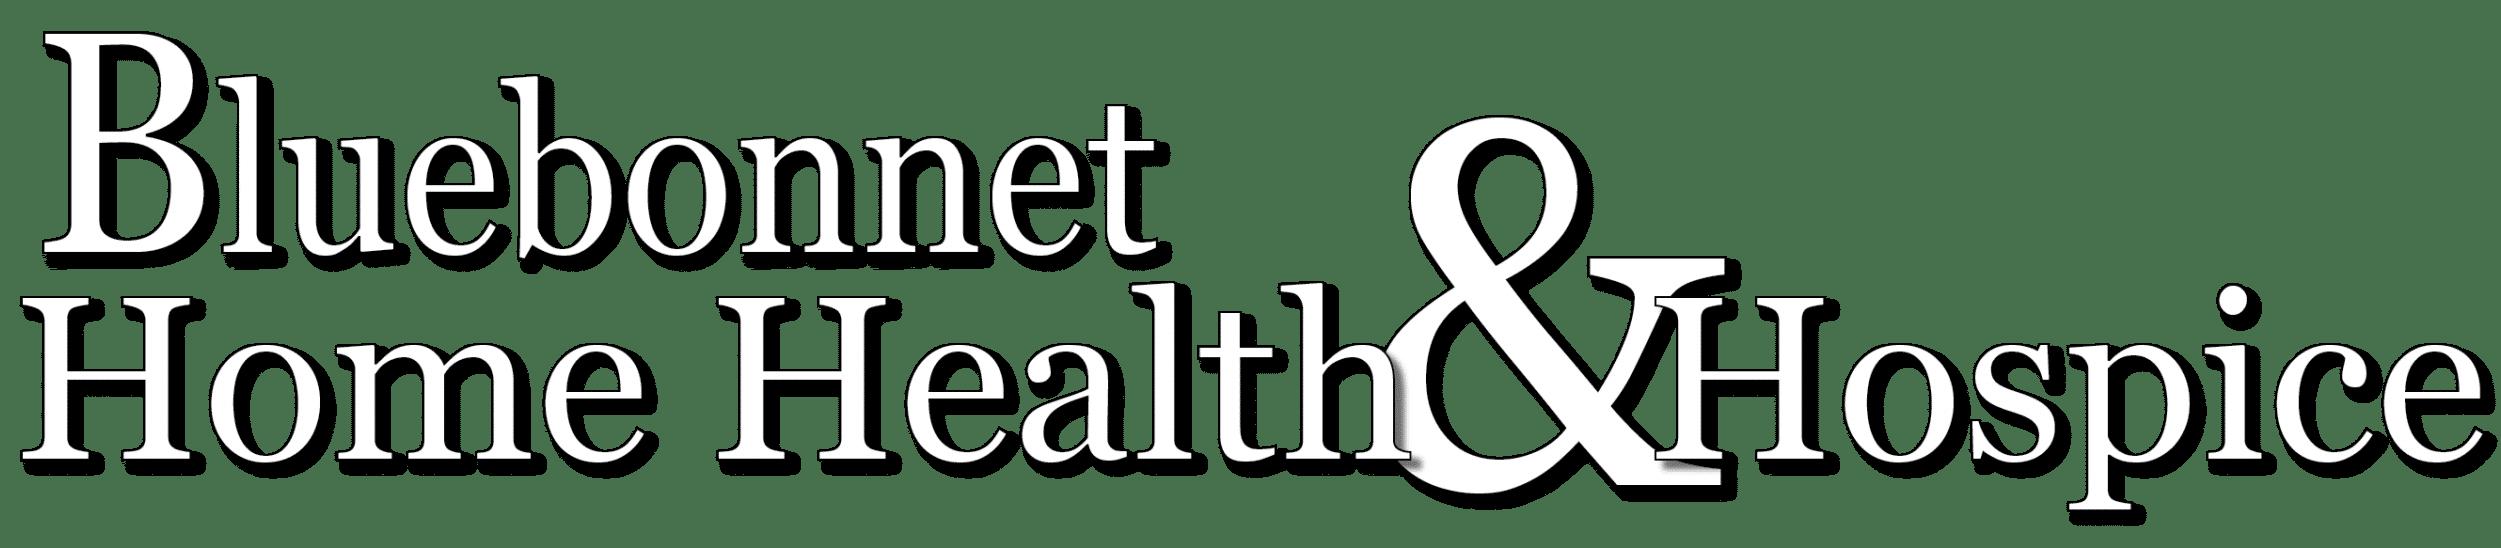 Bluebonnet Home Health & Hospice